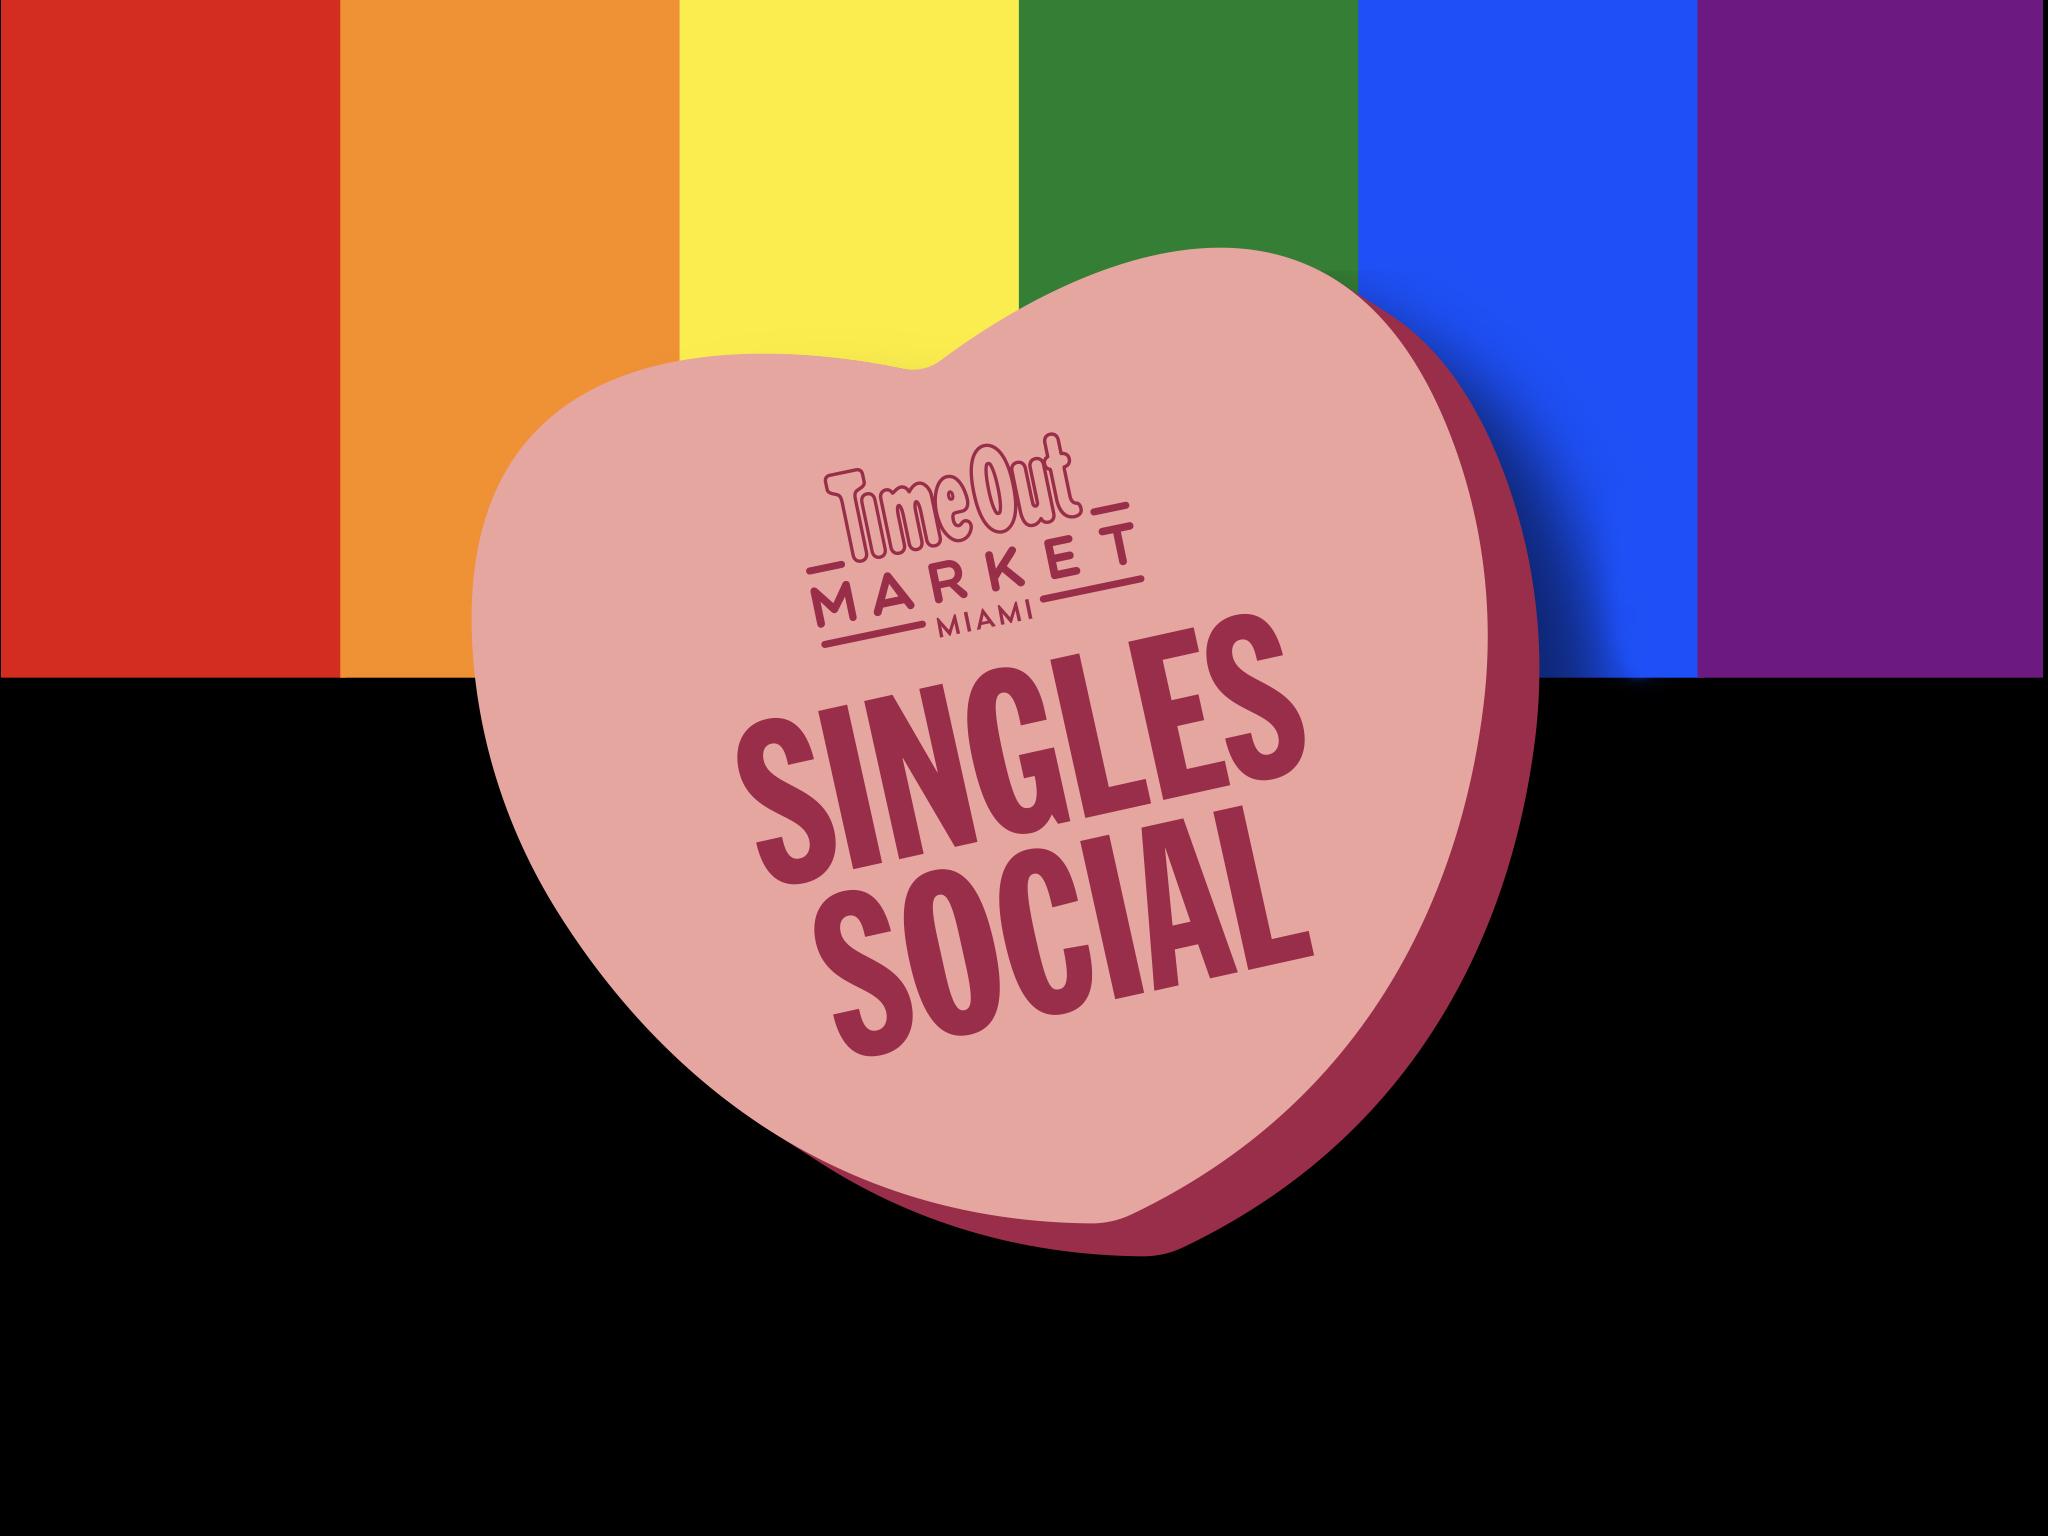 SIngles Social - LGBTQ